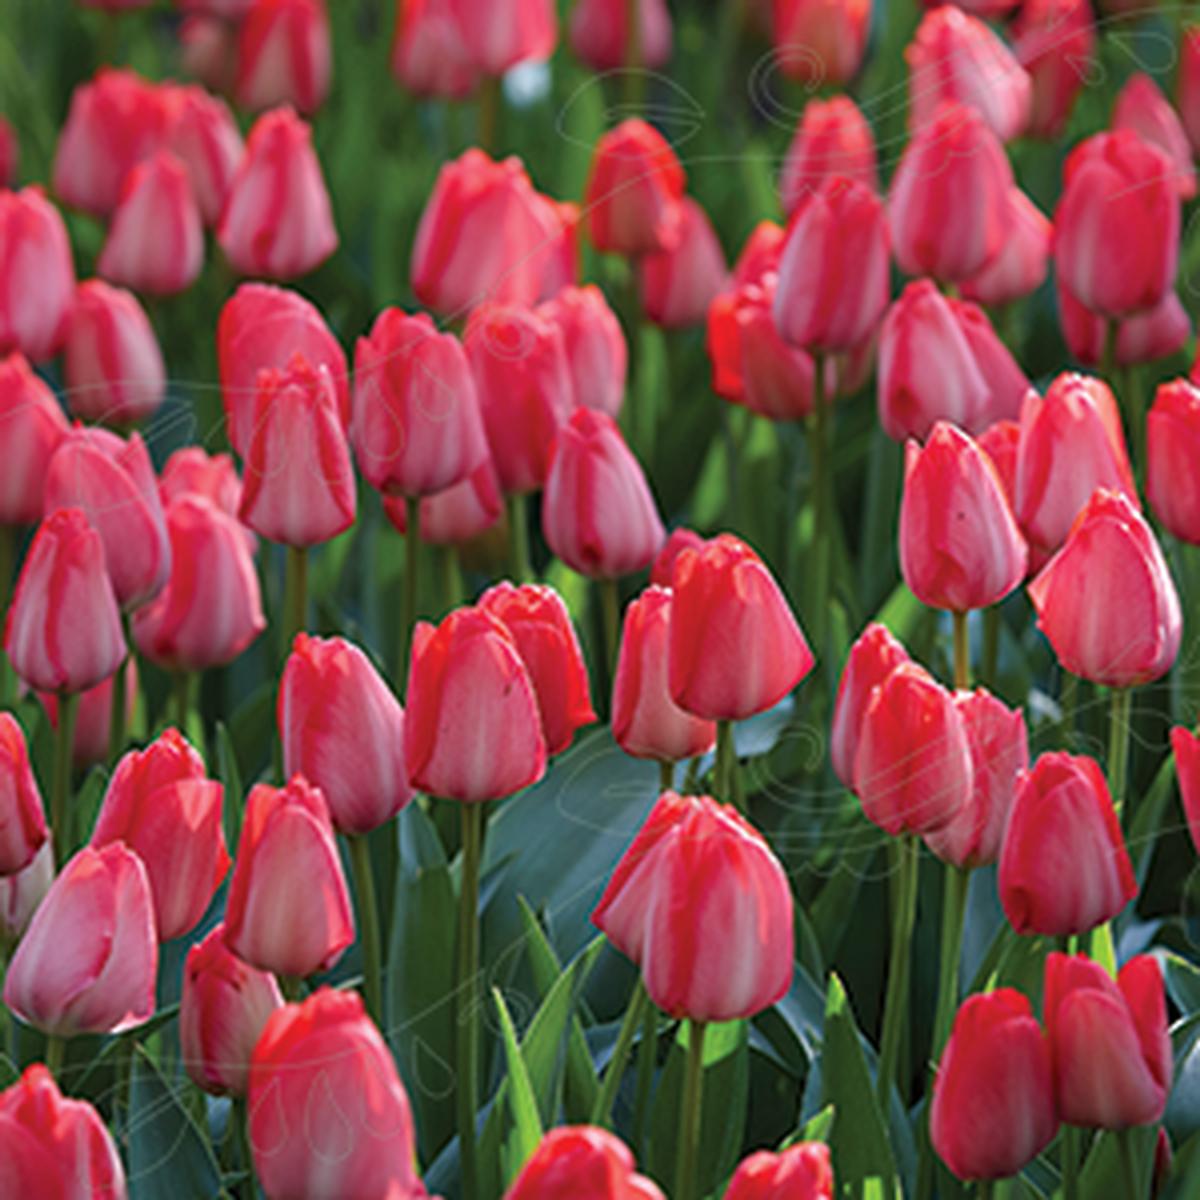 Tulipan, Darwinhybrid 'Van Eijk'